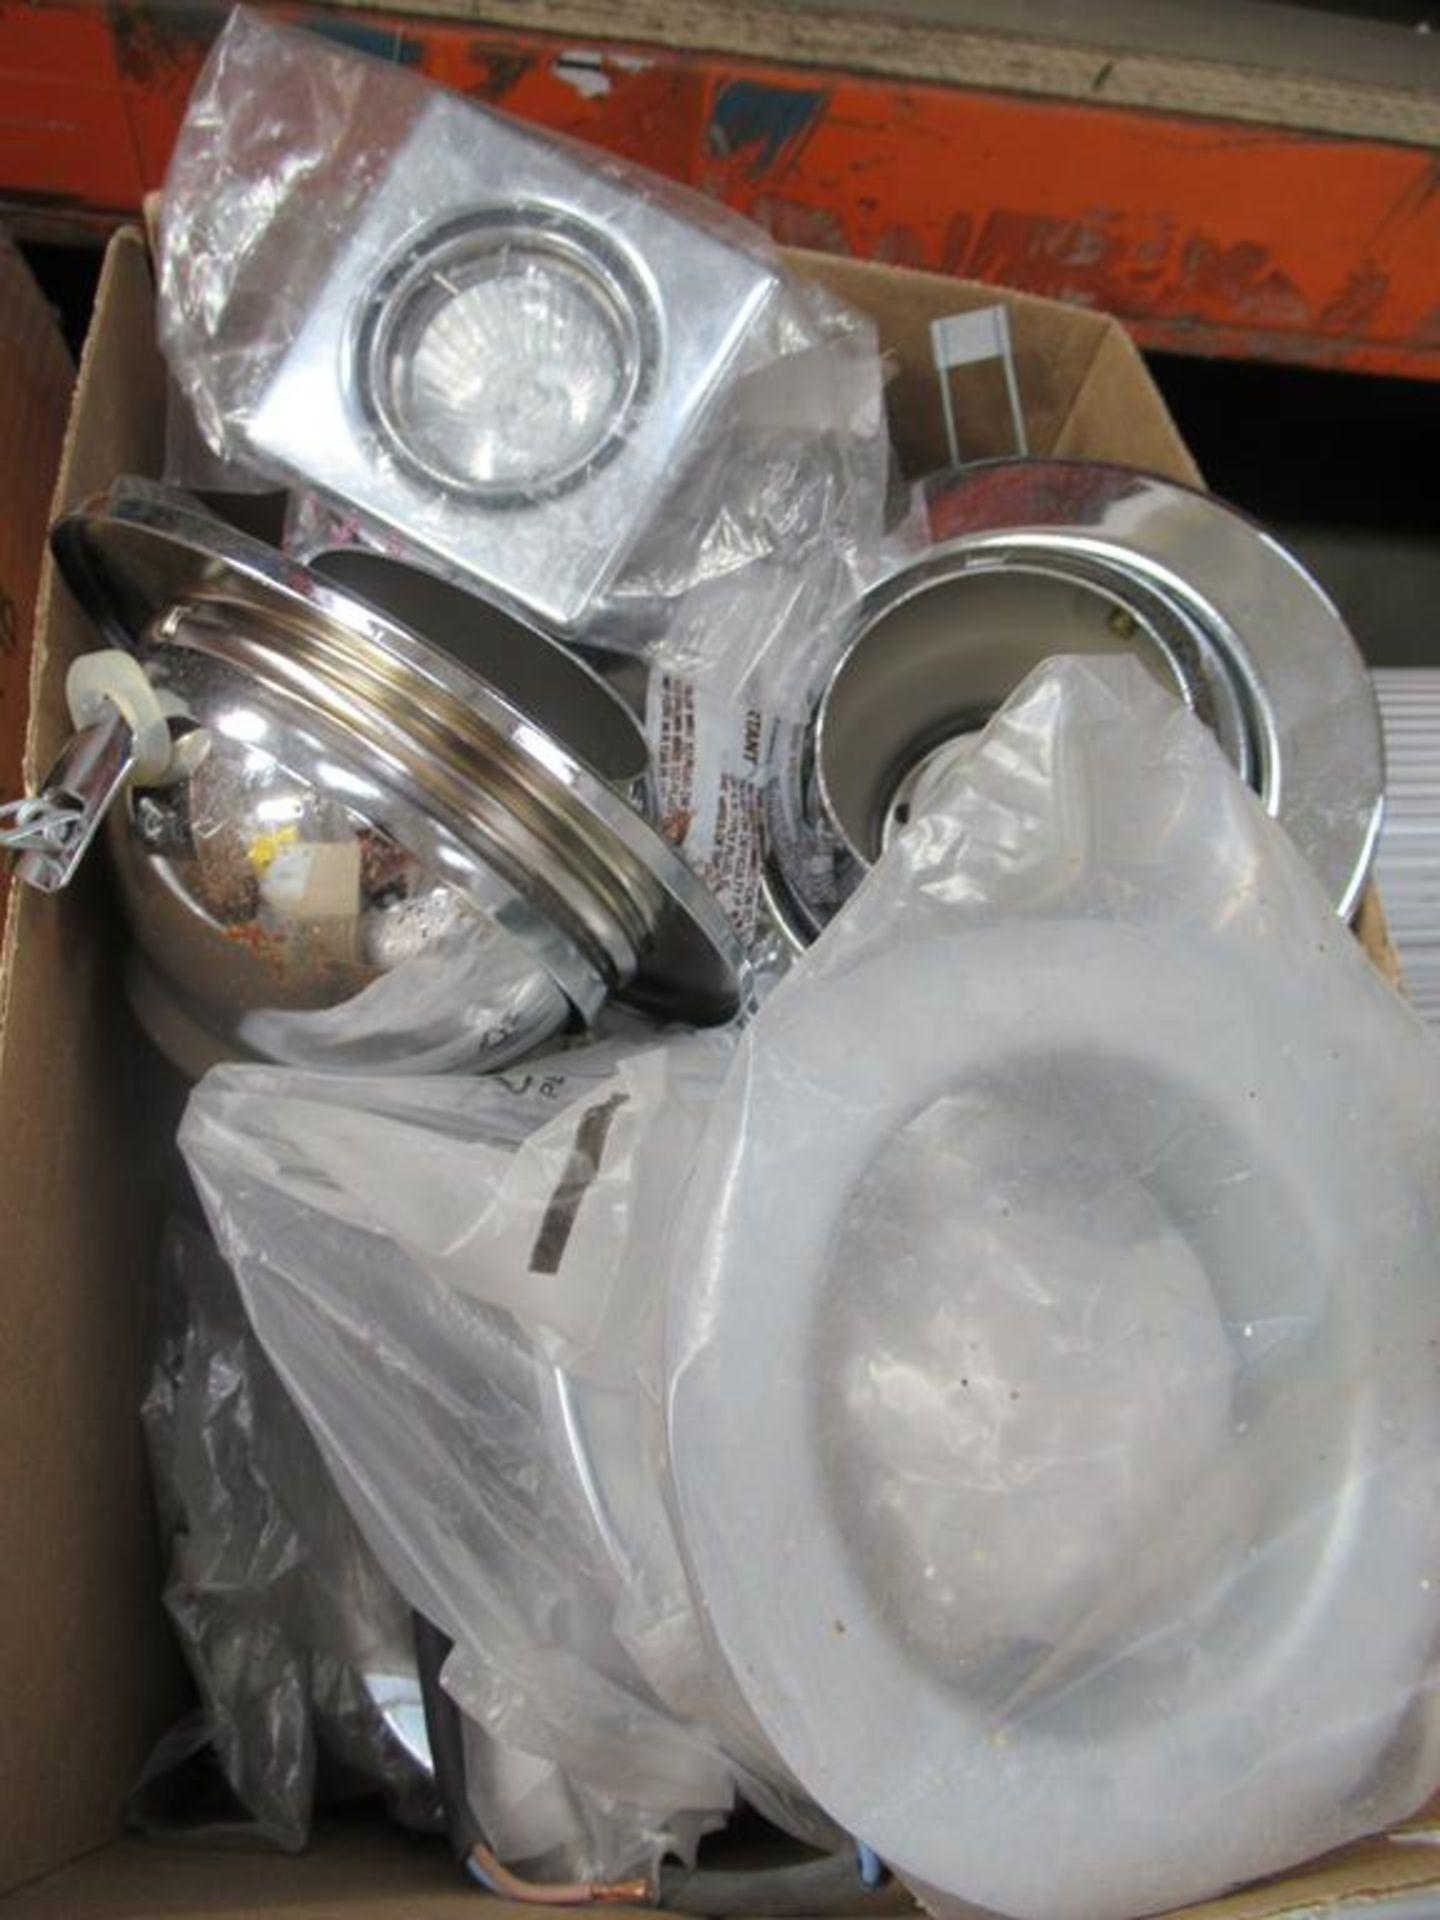 Pallet of assorted lighting including spot lights, - Image 4 of 11